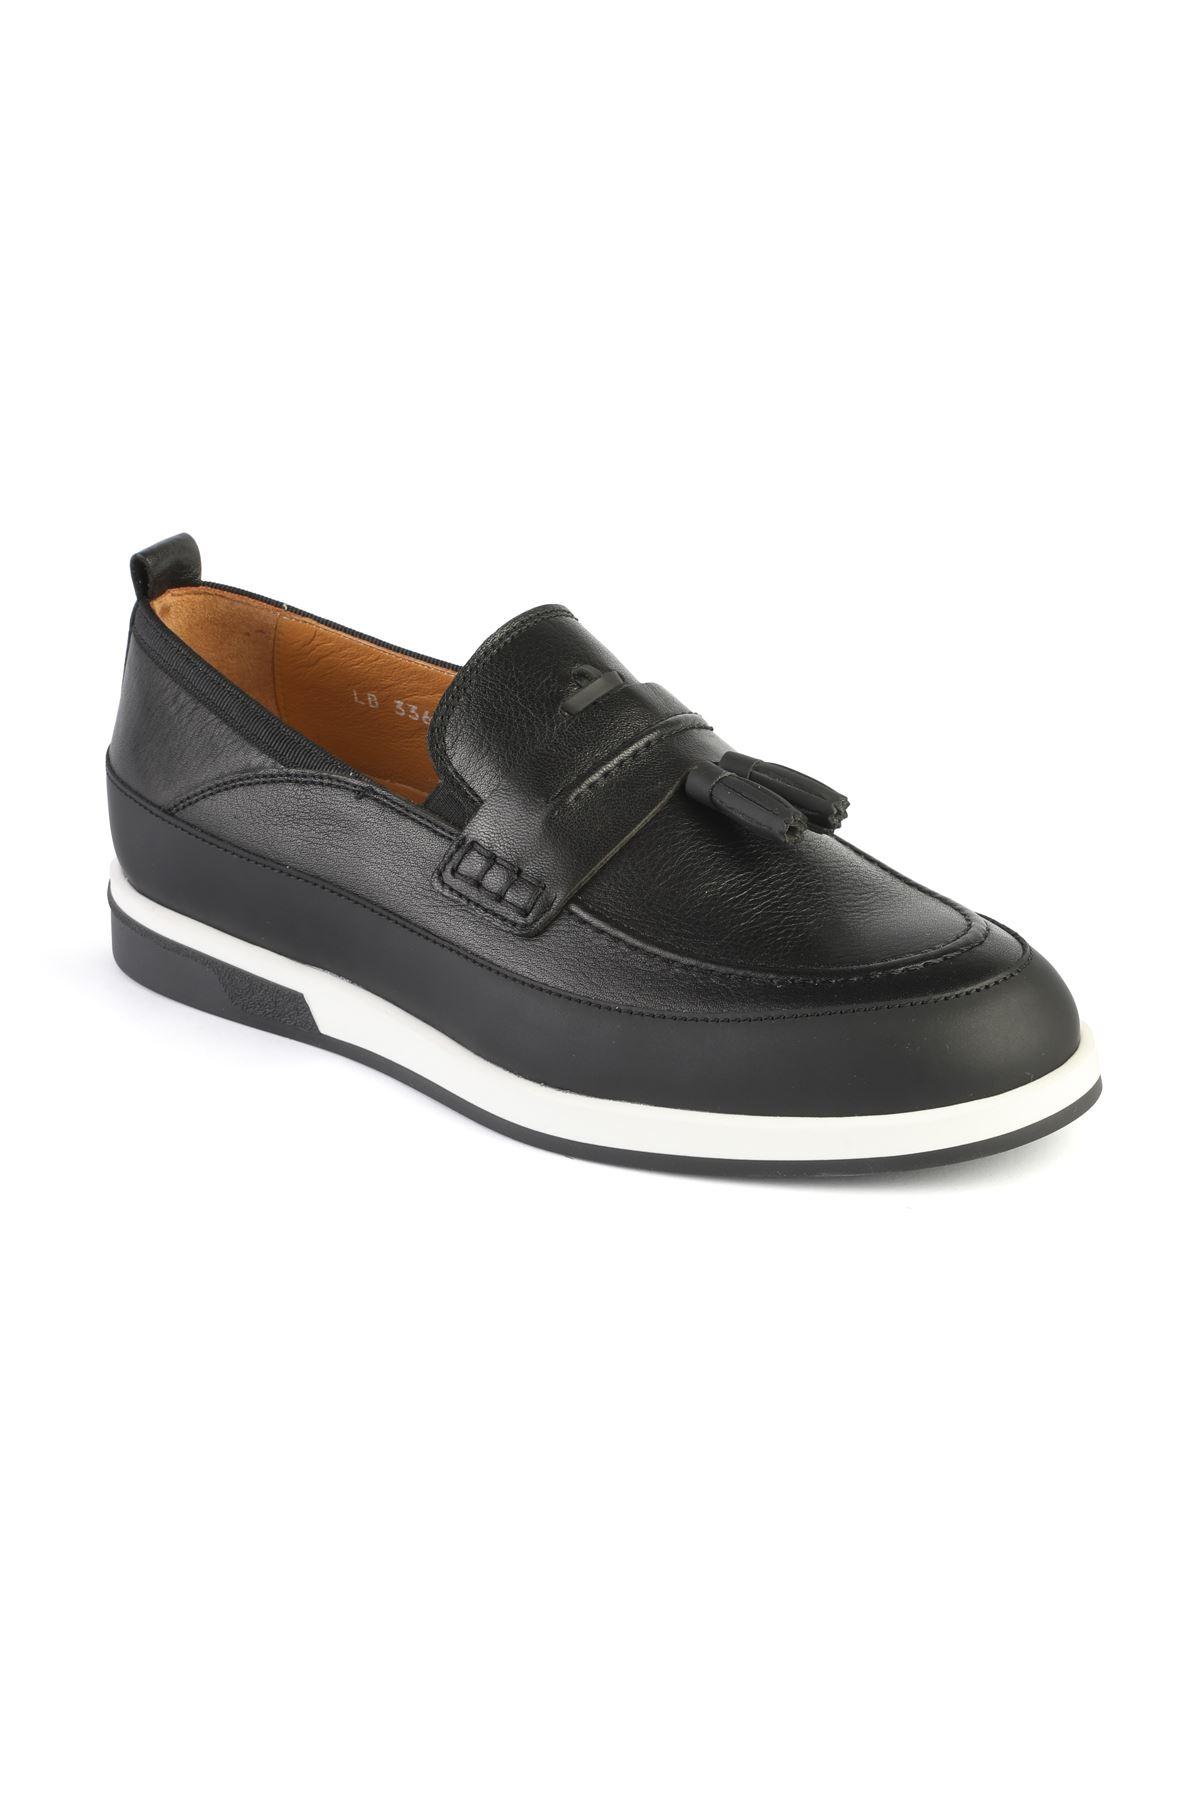 Libero 3366 Black Loafer Shoes